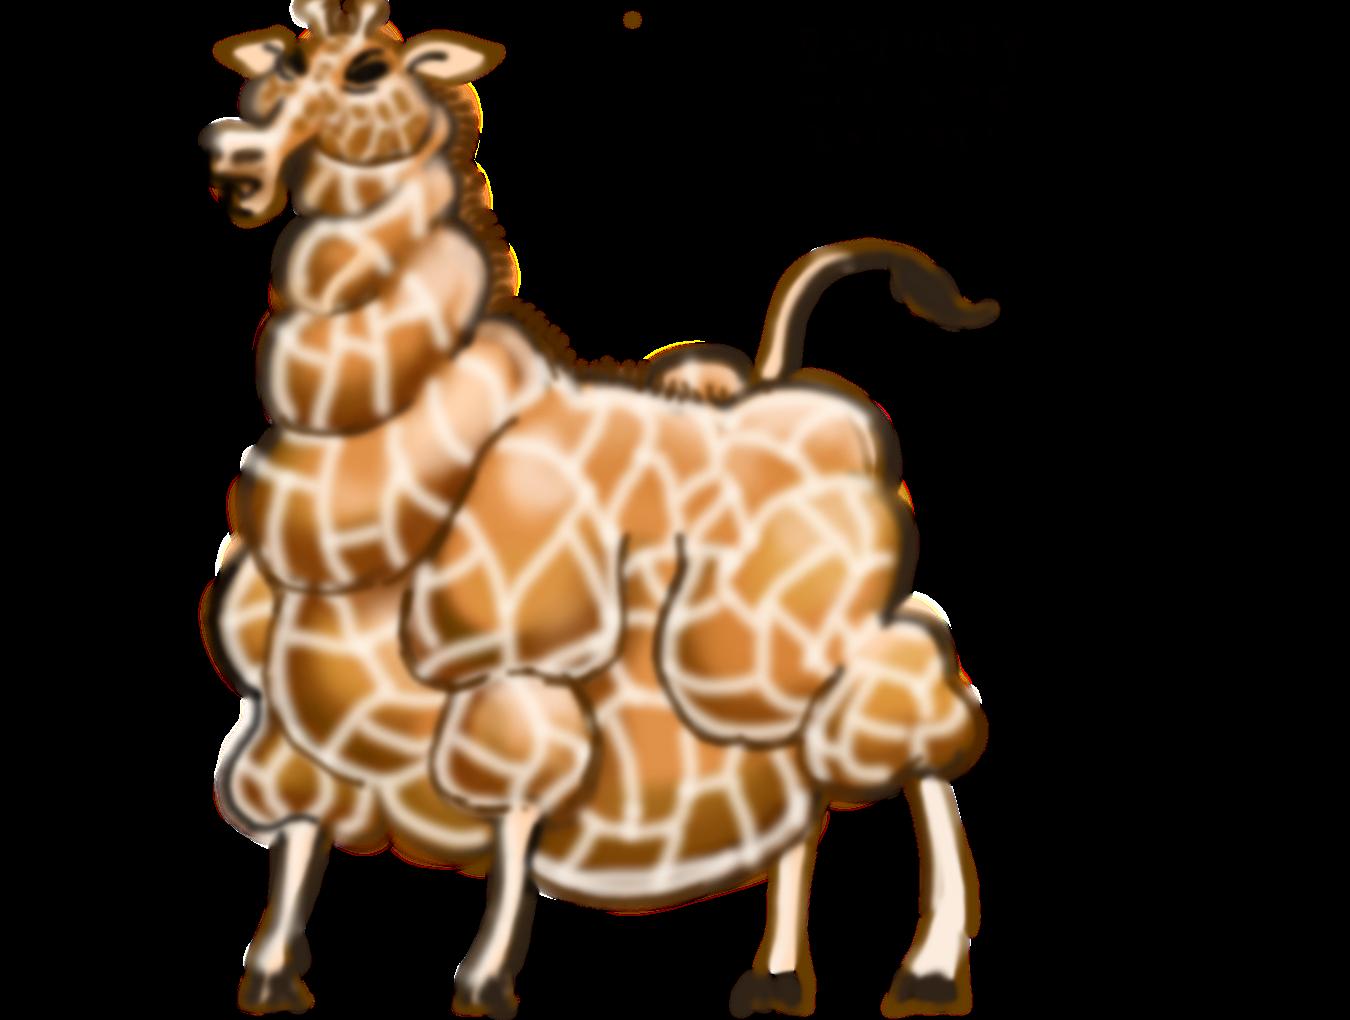 fat giraffe by zenzmurfy on deviantart